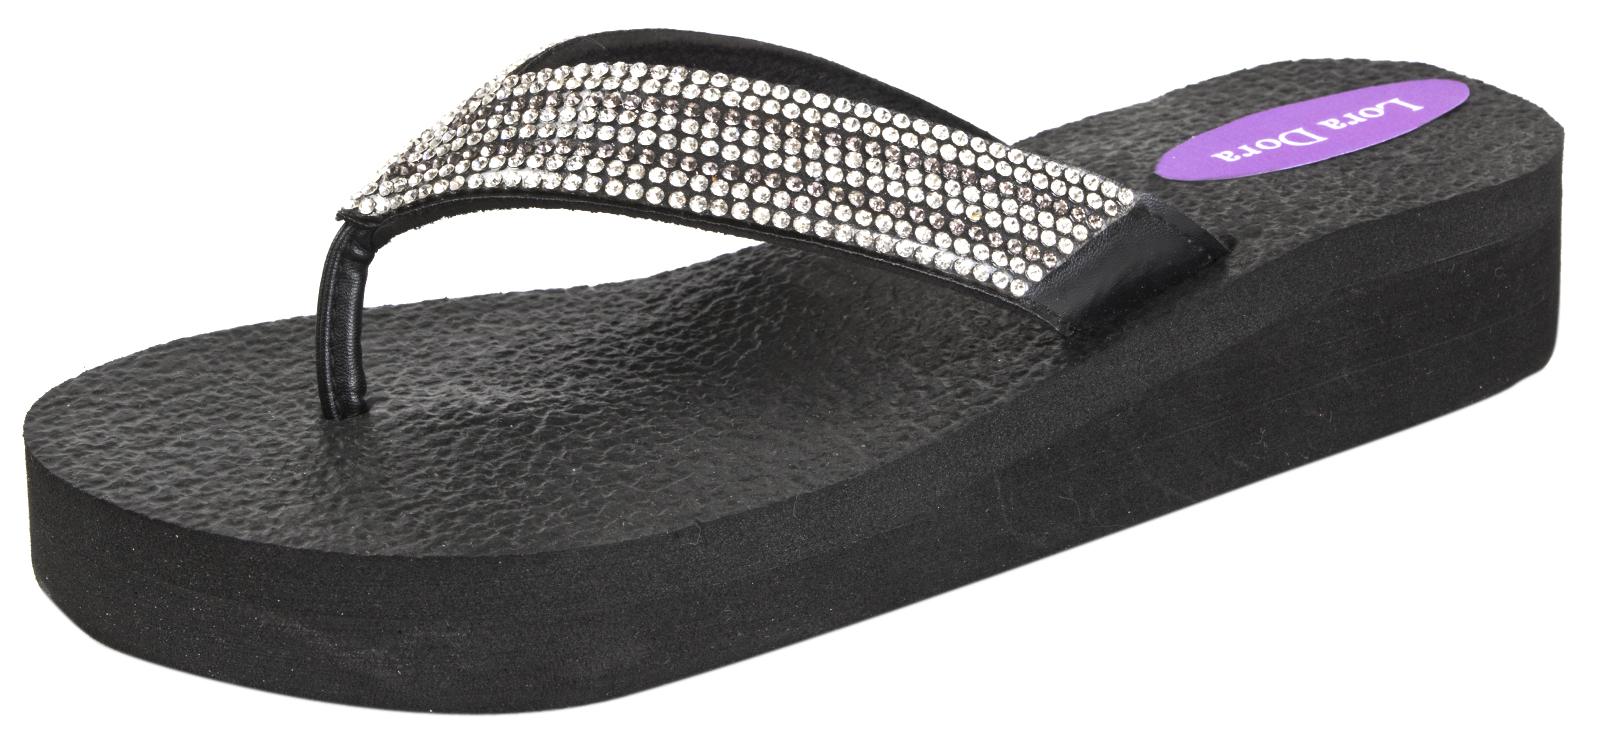 f661c03a6e8 Womens Eva Platform Sandals Diamante Flip Flops Summer Toe Posts Wedges Size